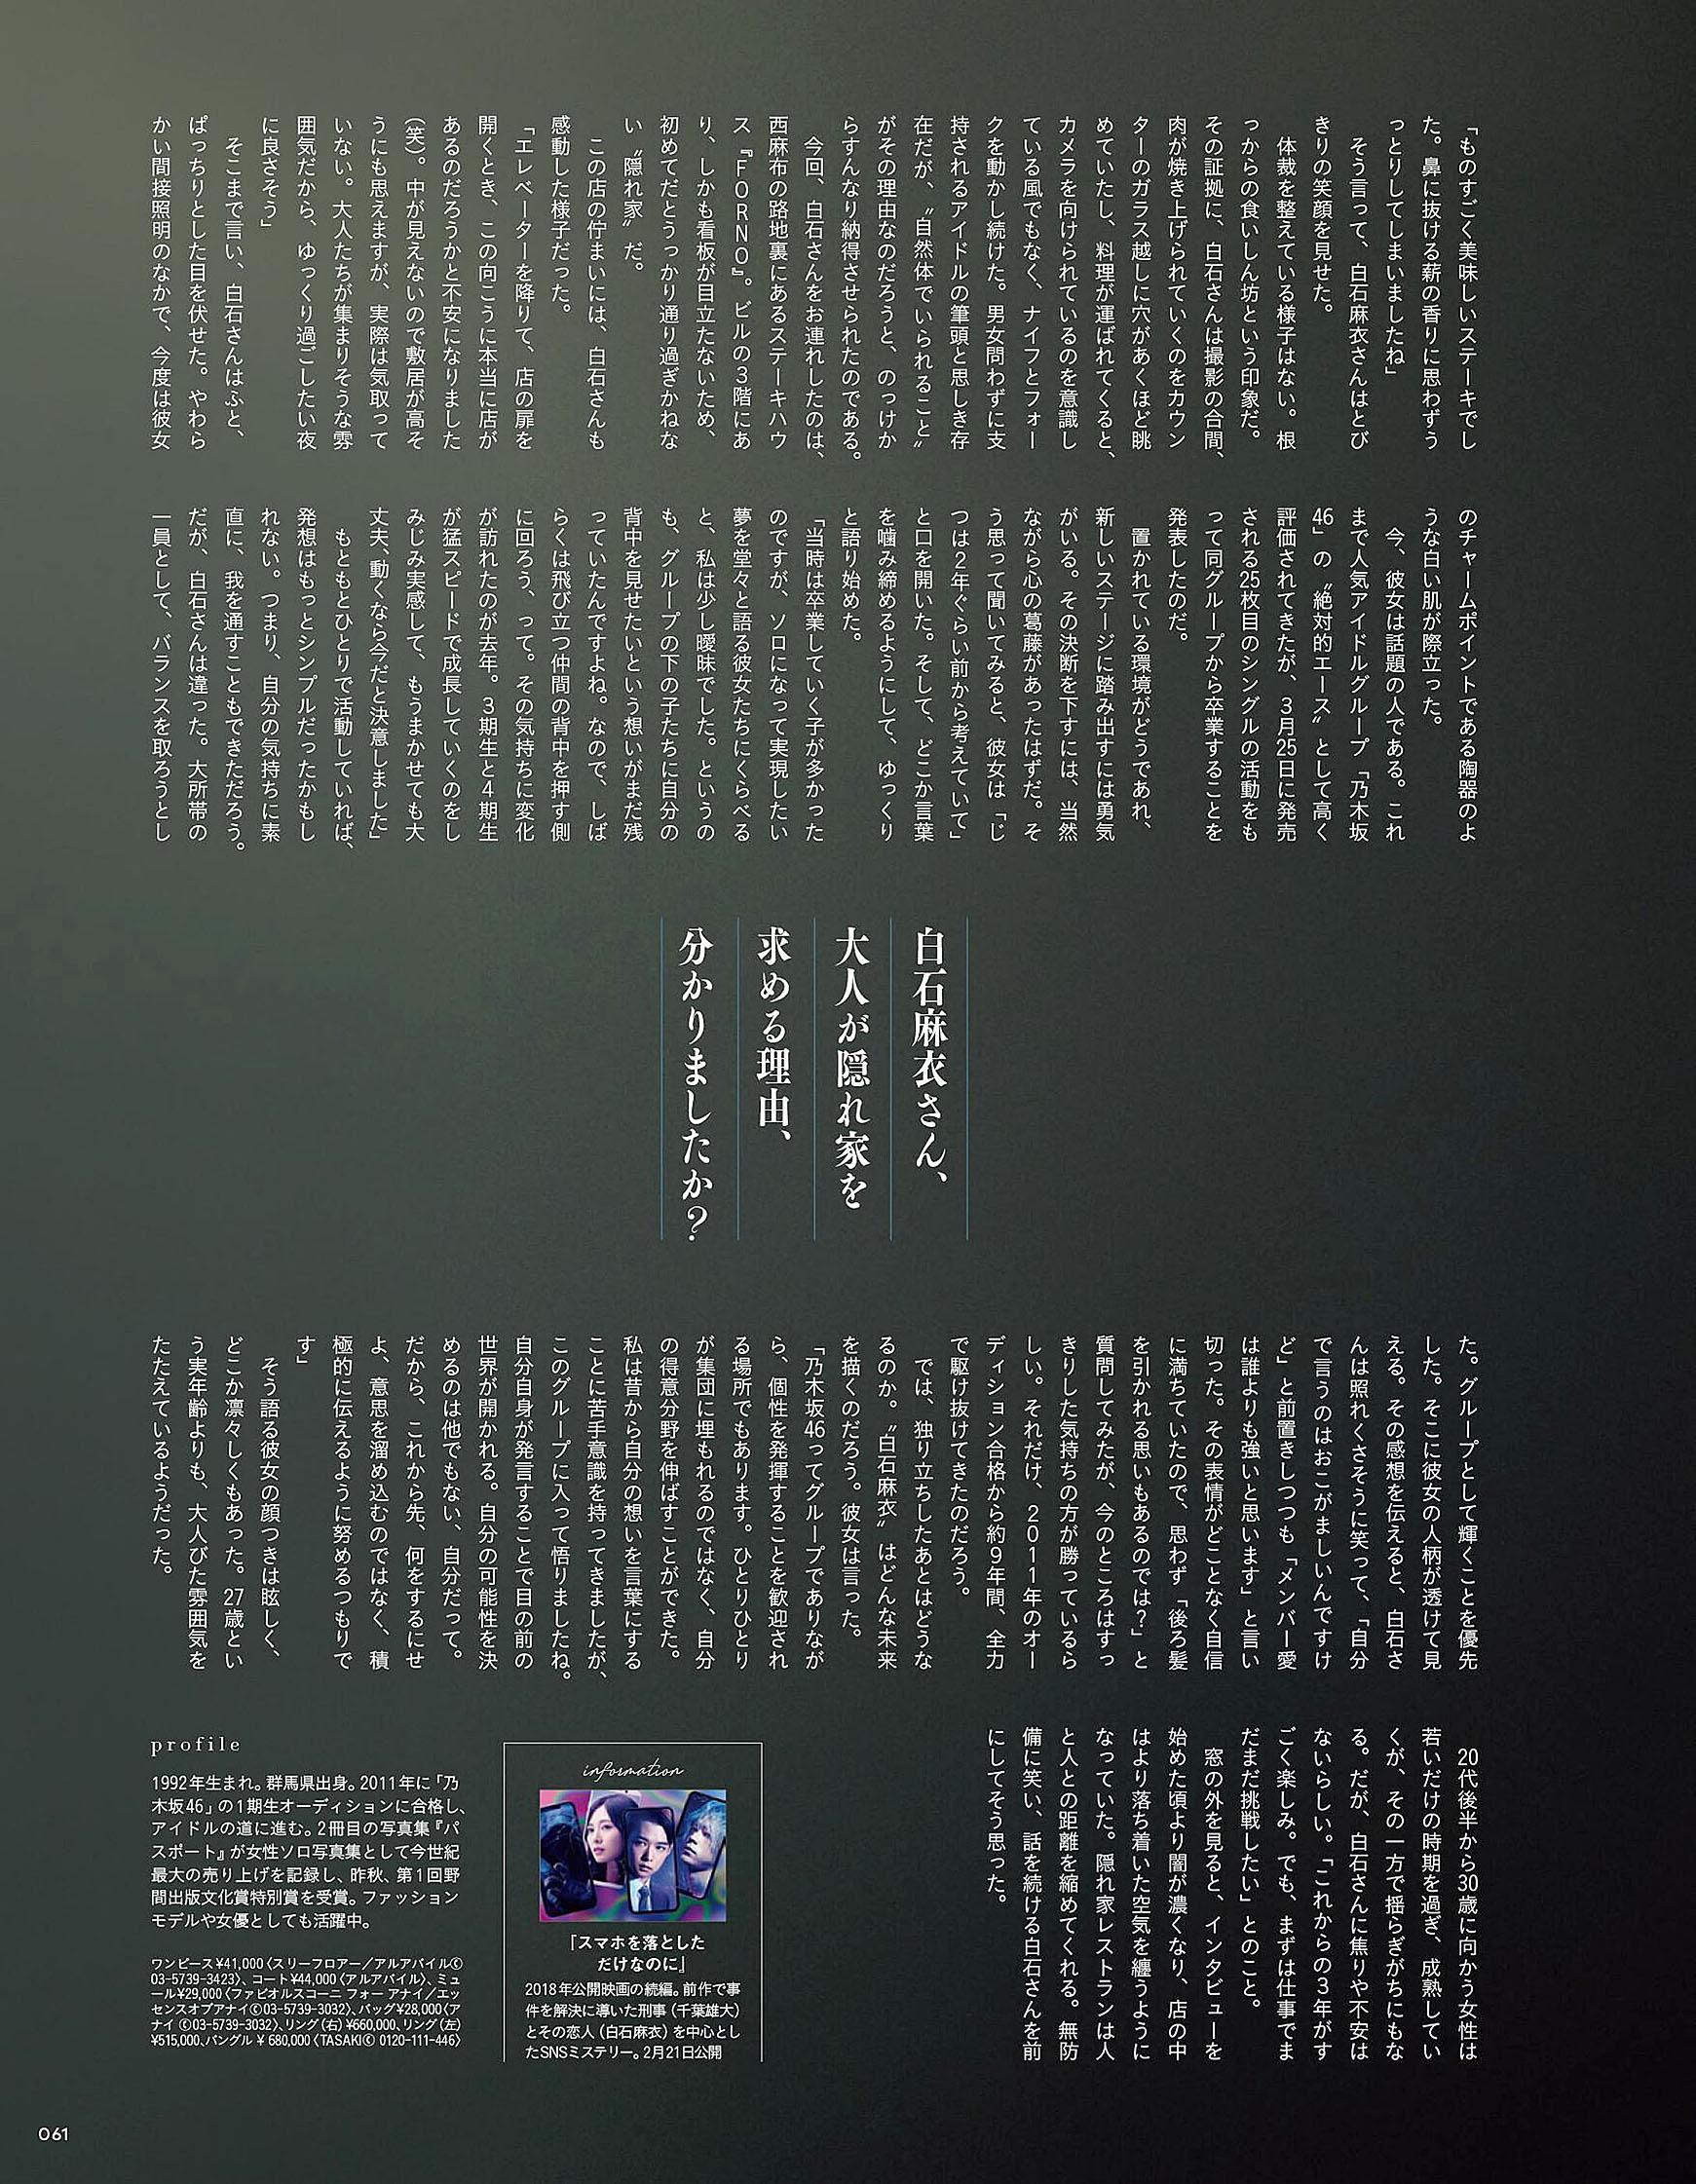 MShiraishi Tokyo Calendar 2020-04 08.jpg